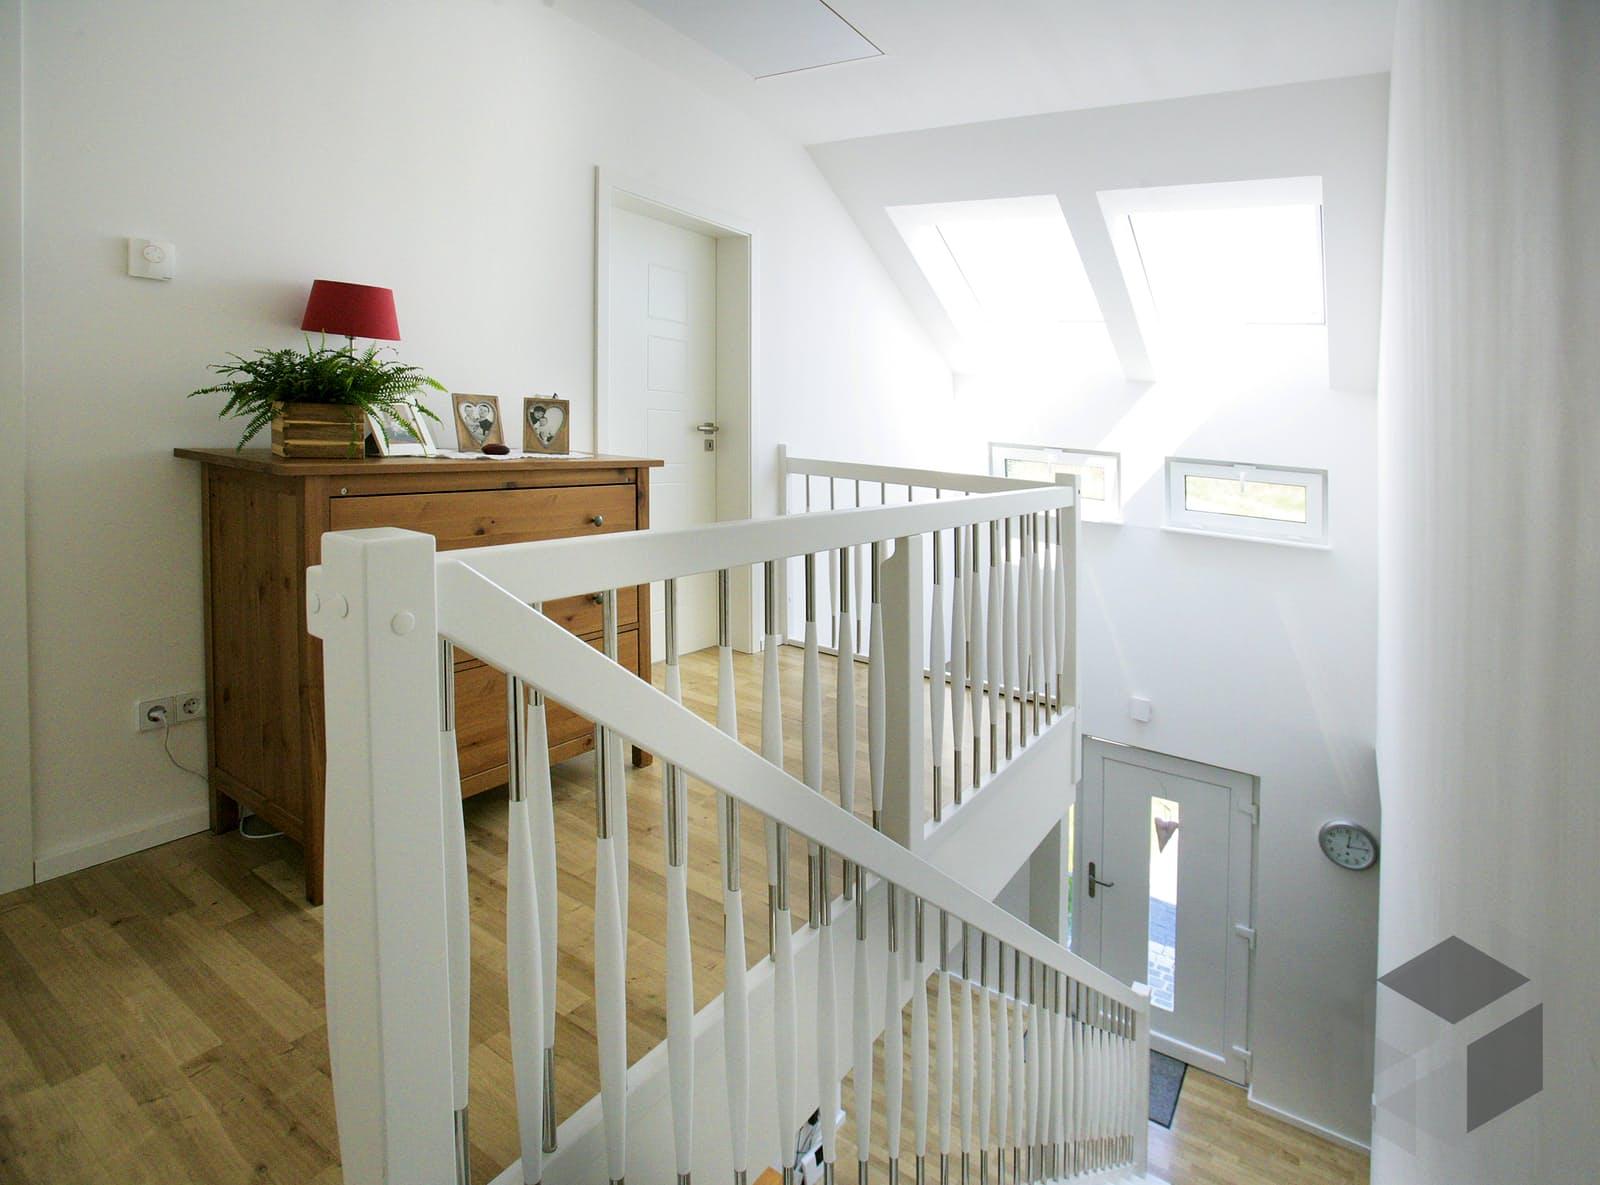 point 129 a von dan wood komplette daten bersicht. Black Bedroom Furniture Sets. Home Design Ideas